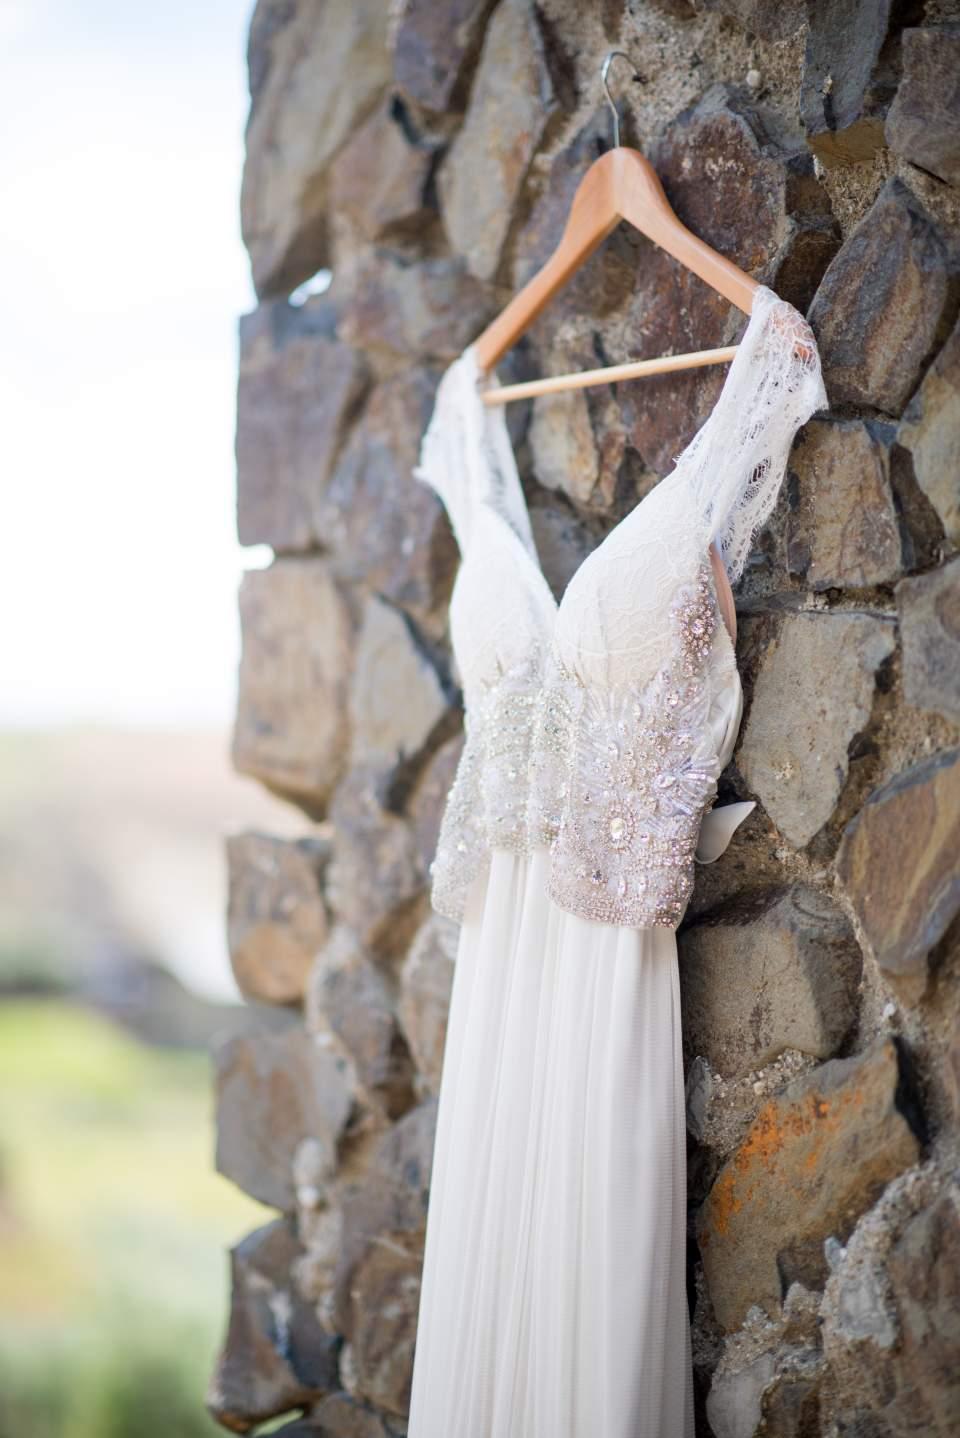 boho wedding dress hanging